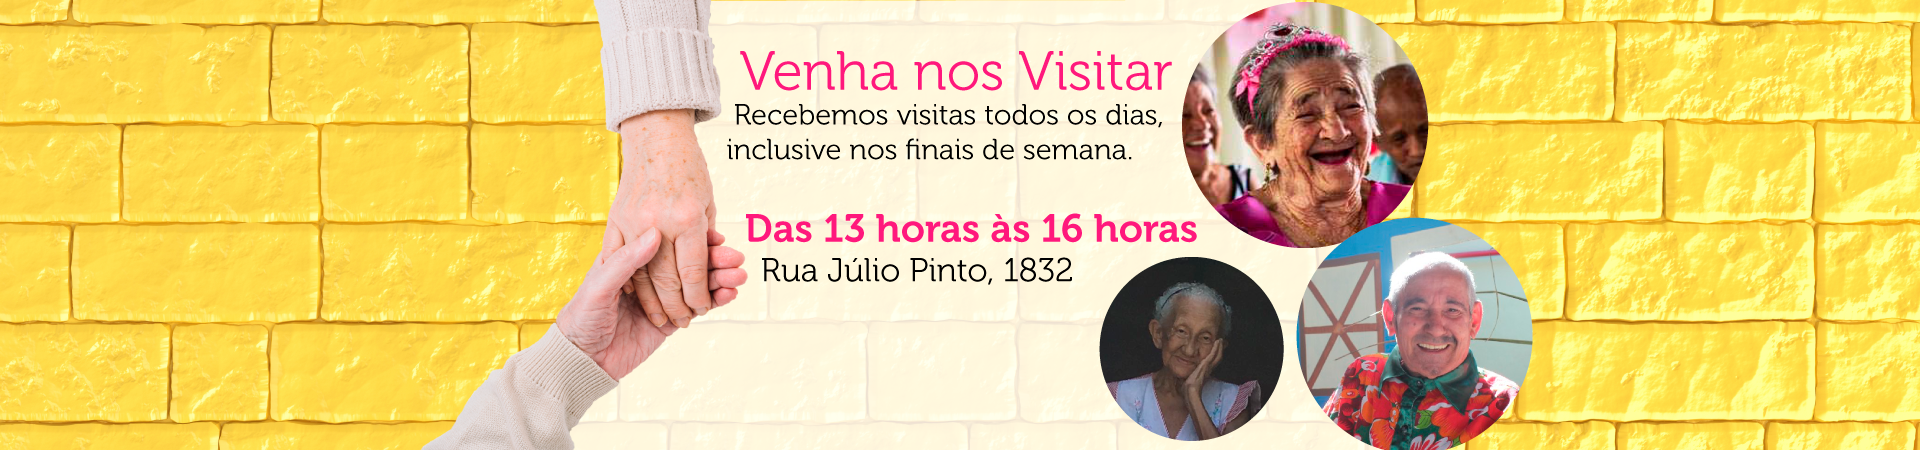 18-01-2019---15-30---2019-01-15-Lar-Torres-de-Melo-Banner-5